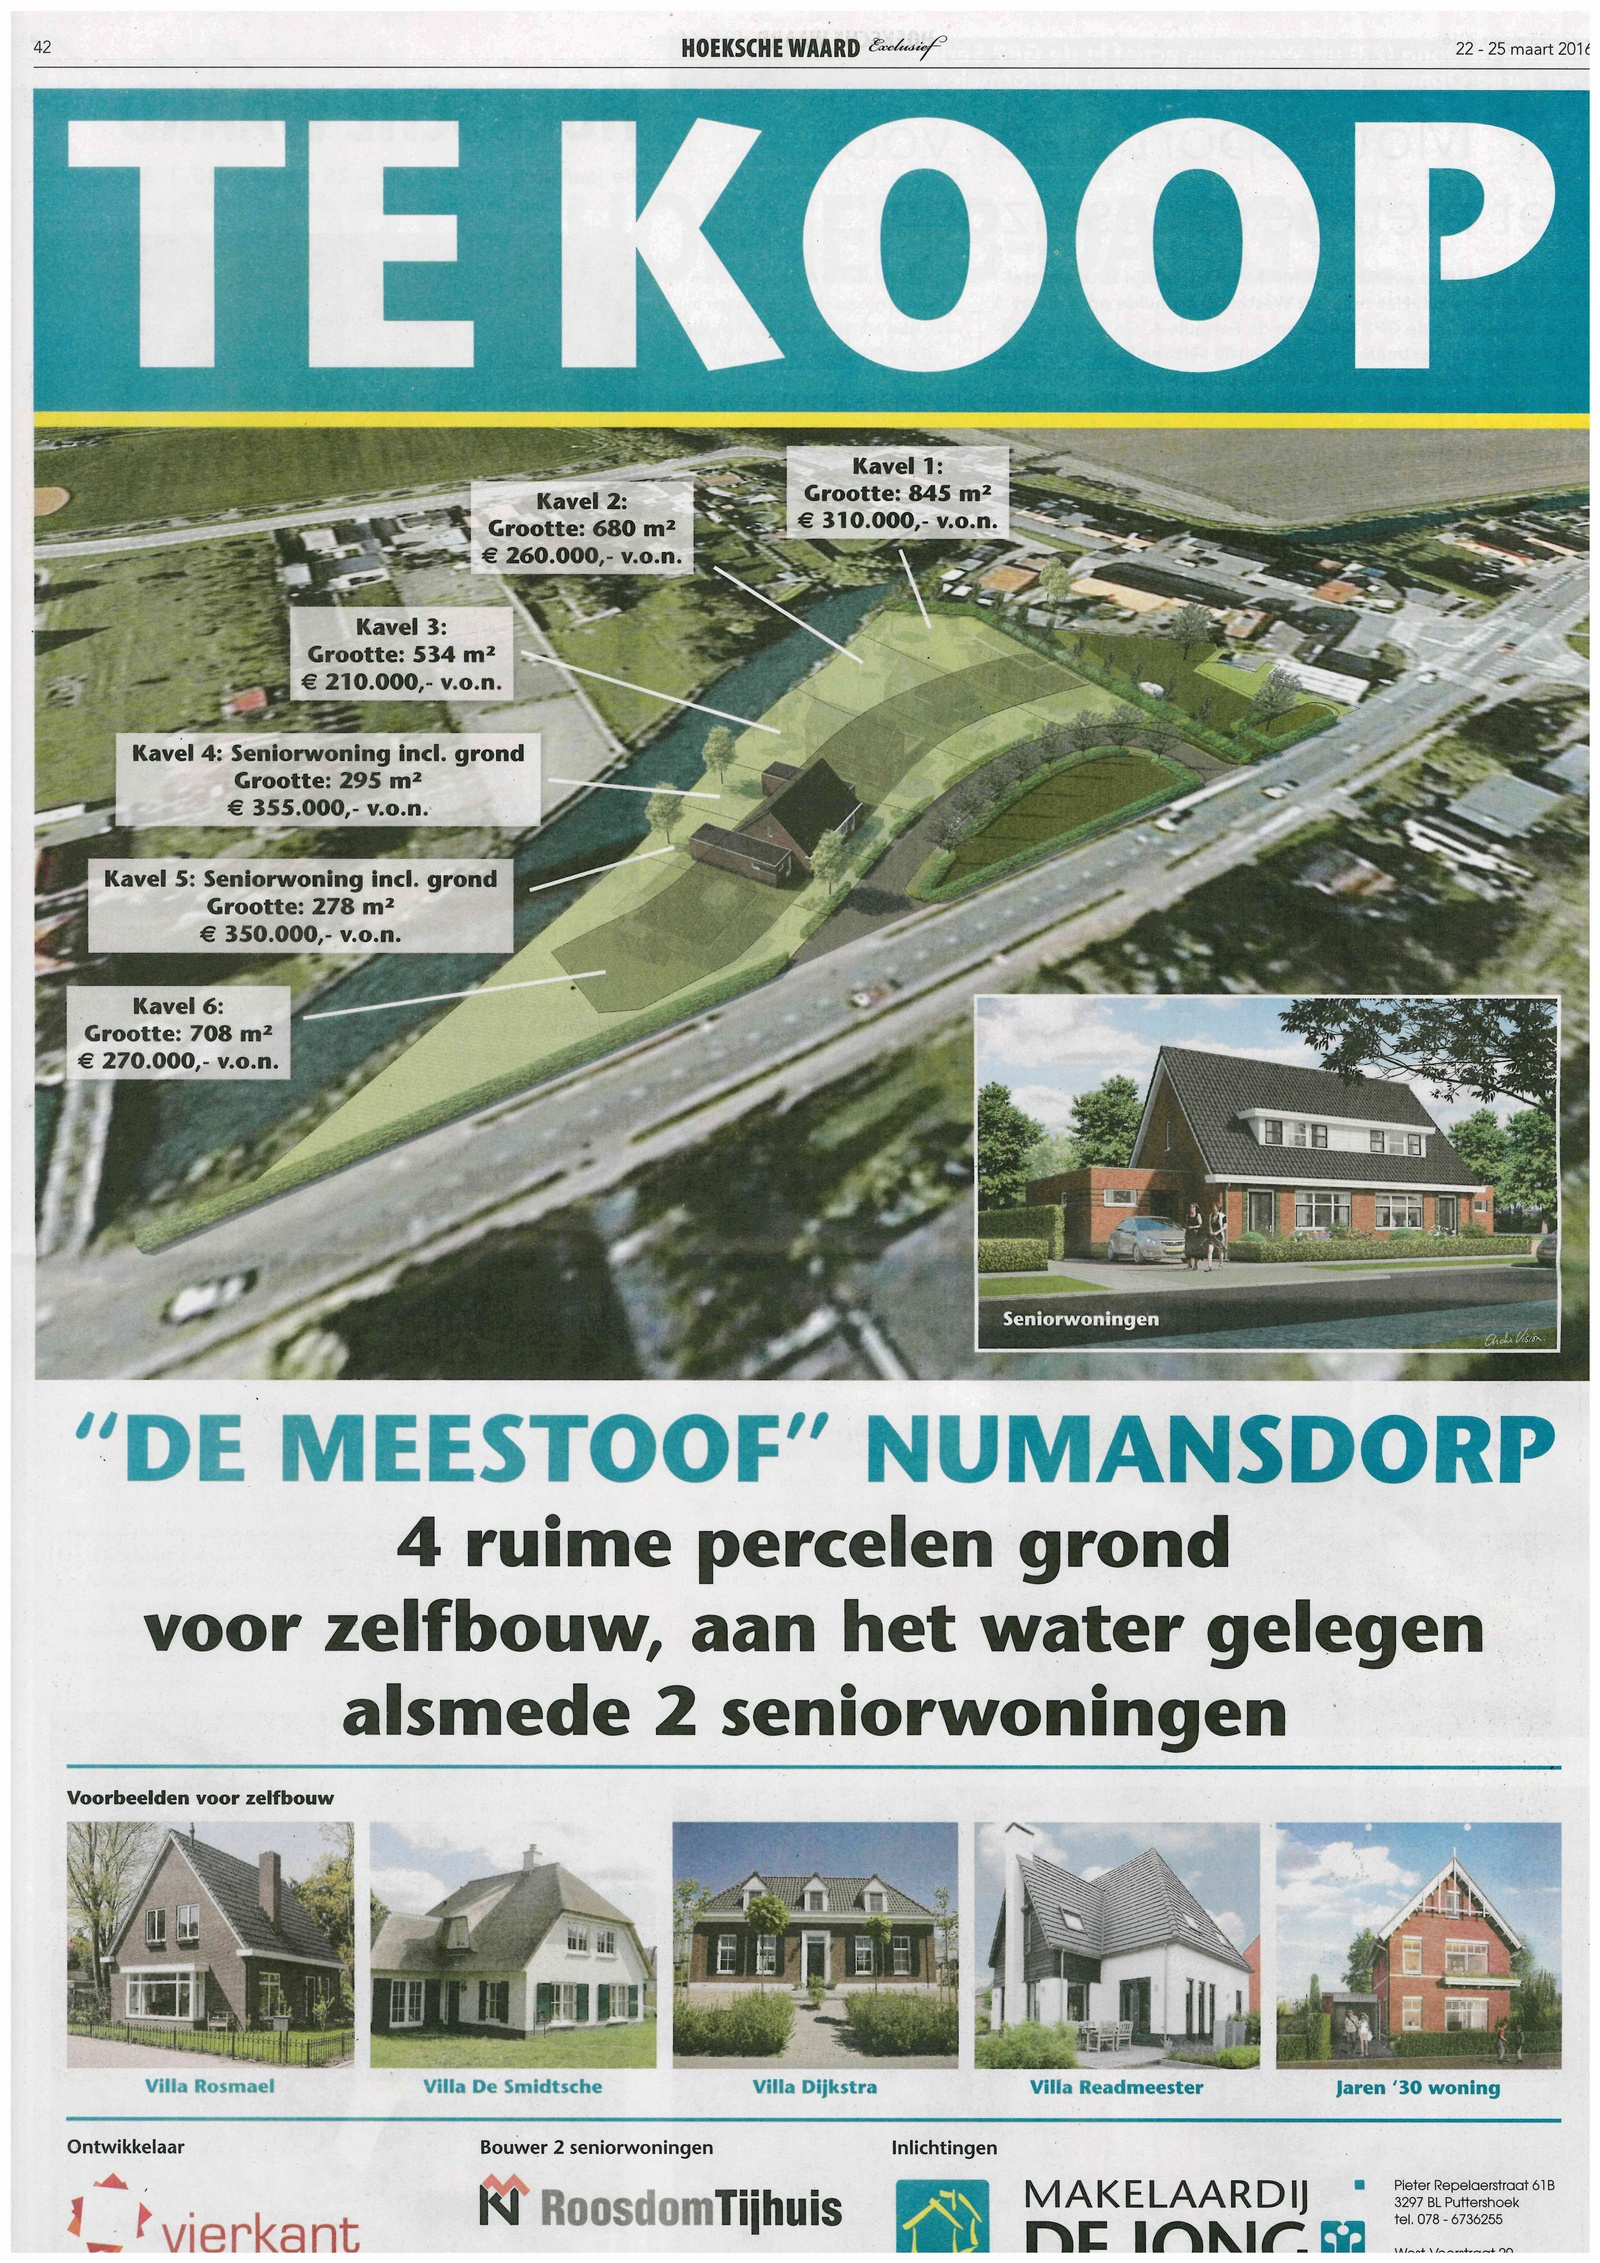 knipsel-project-demeestoof-numansdorp-hwexcl-maart2016-01